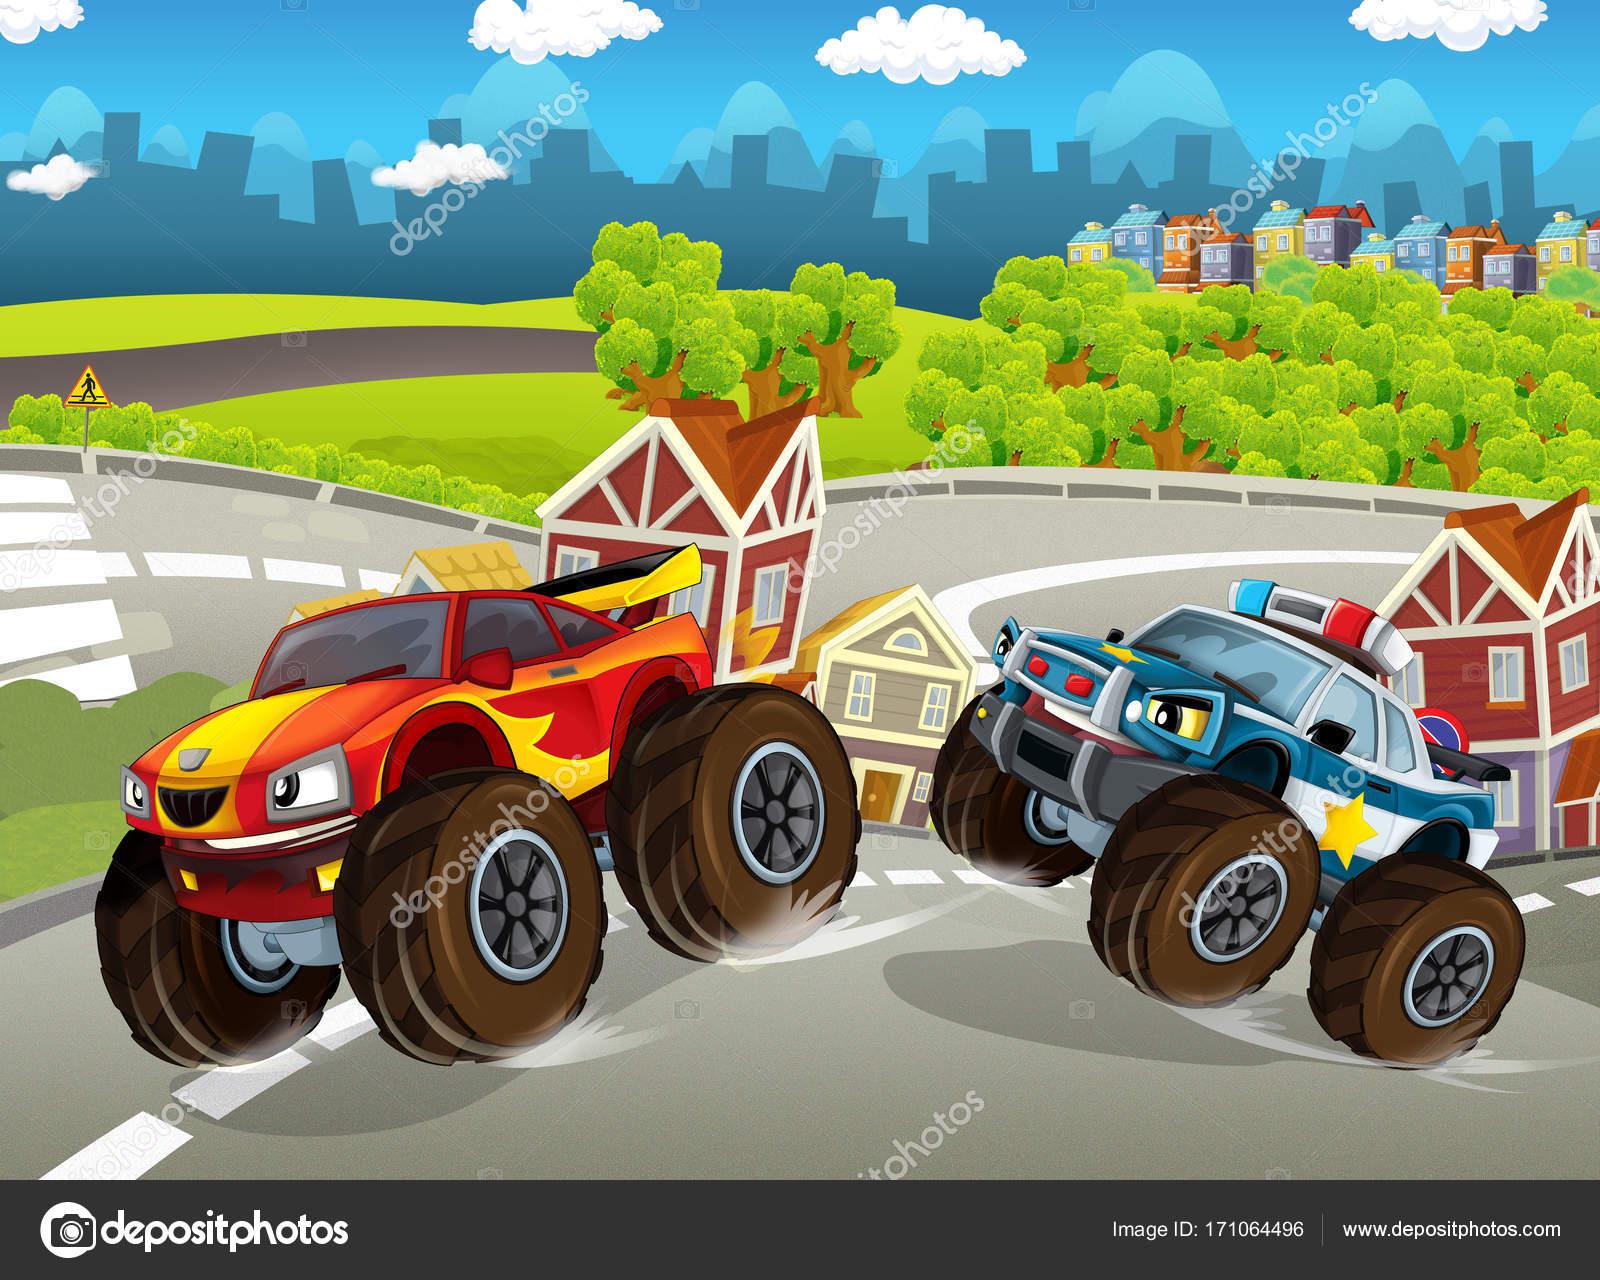 Pictures Police Monster Trucks Cartoon Scene Happy Police Monster Truck Ships Planes Background Illustration Stock Photo C Illustrator Hft 171064496